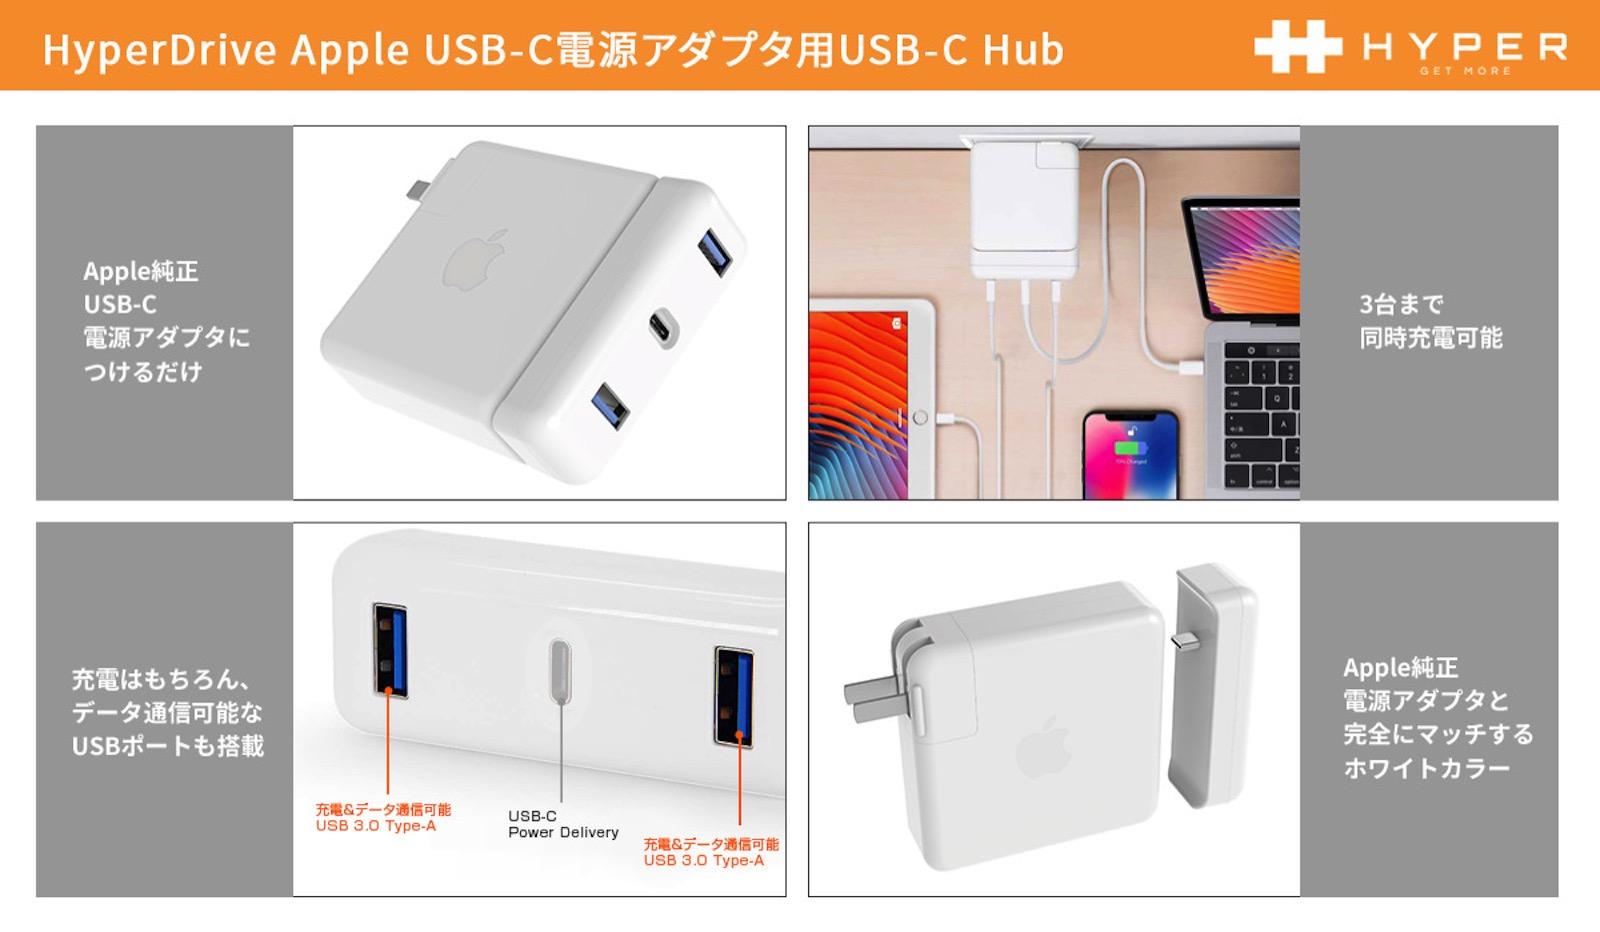 Hyper Drive USB C Hub 2